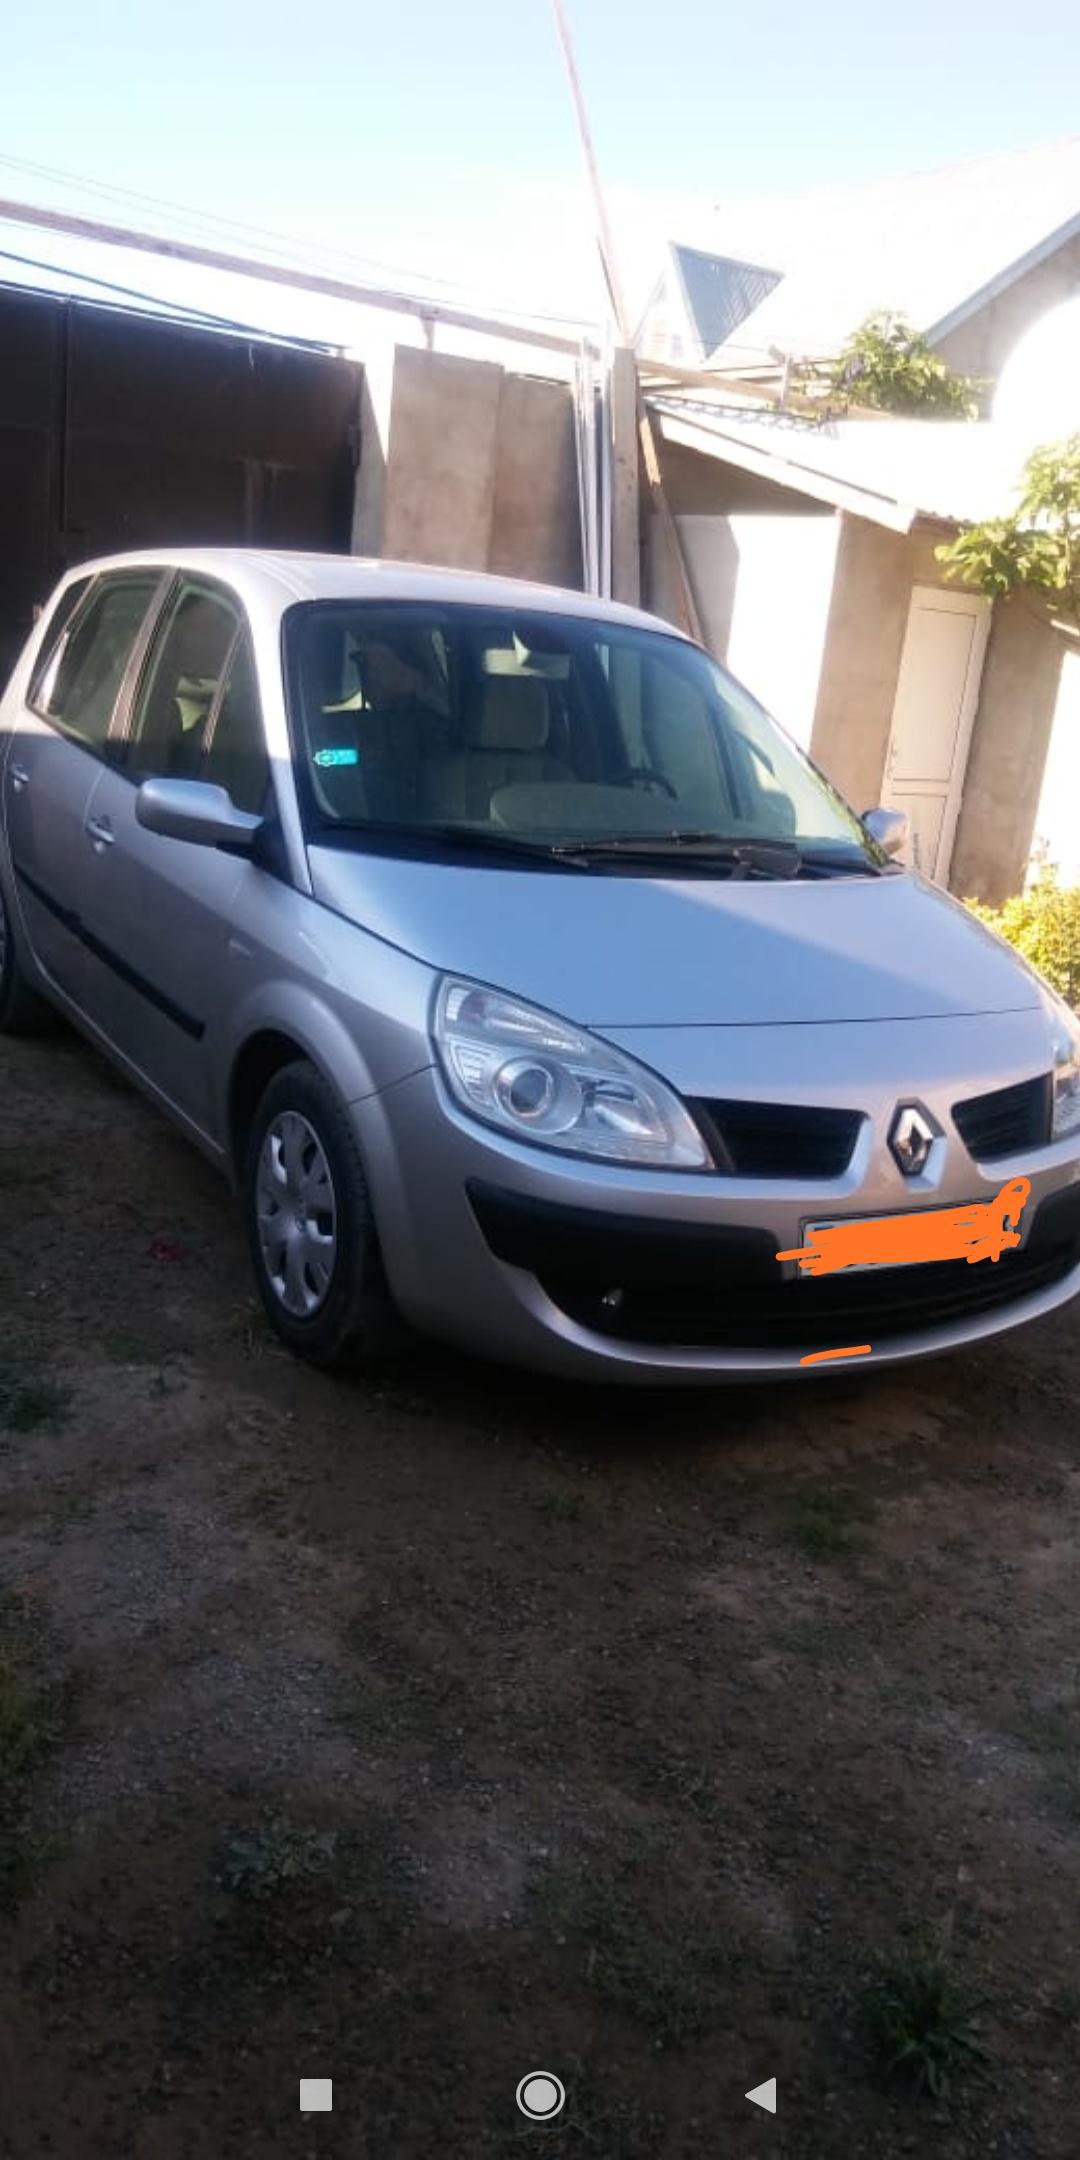 Renault Scenic 1.5(lt) 2007 İkinci əl  $5600